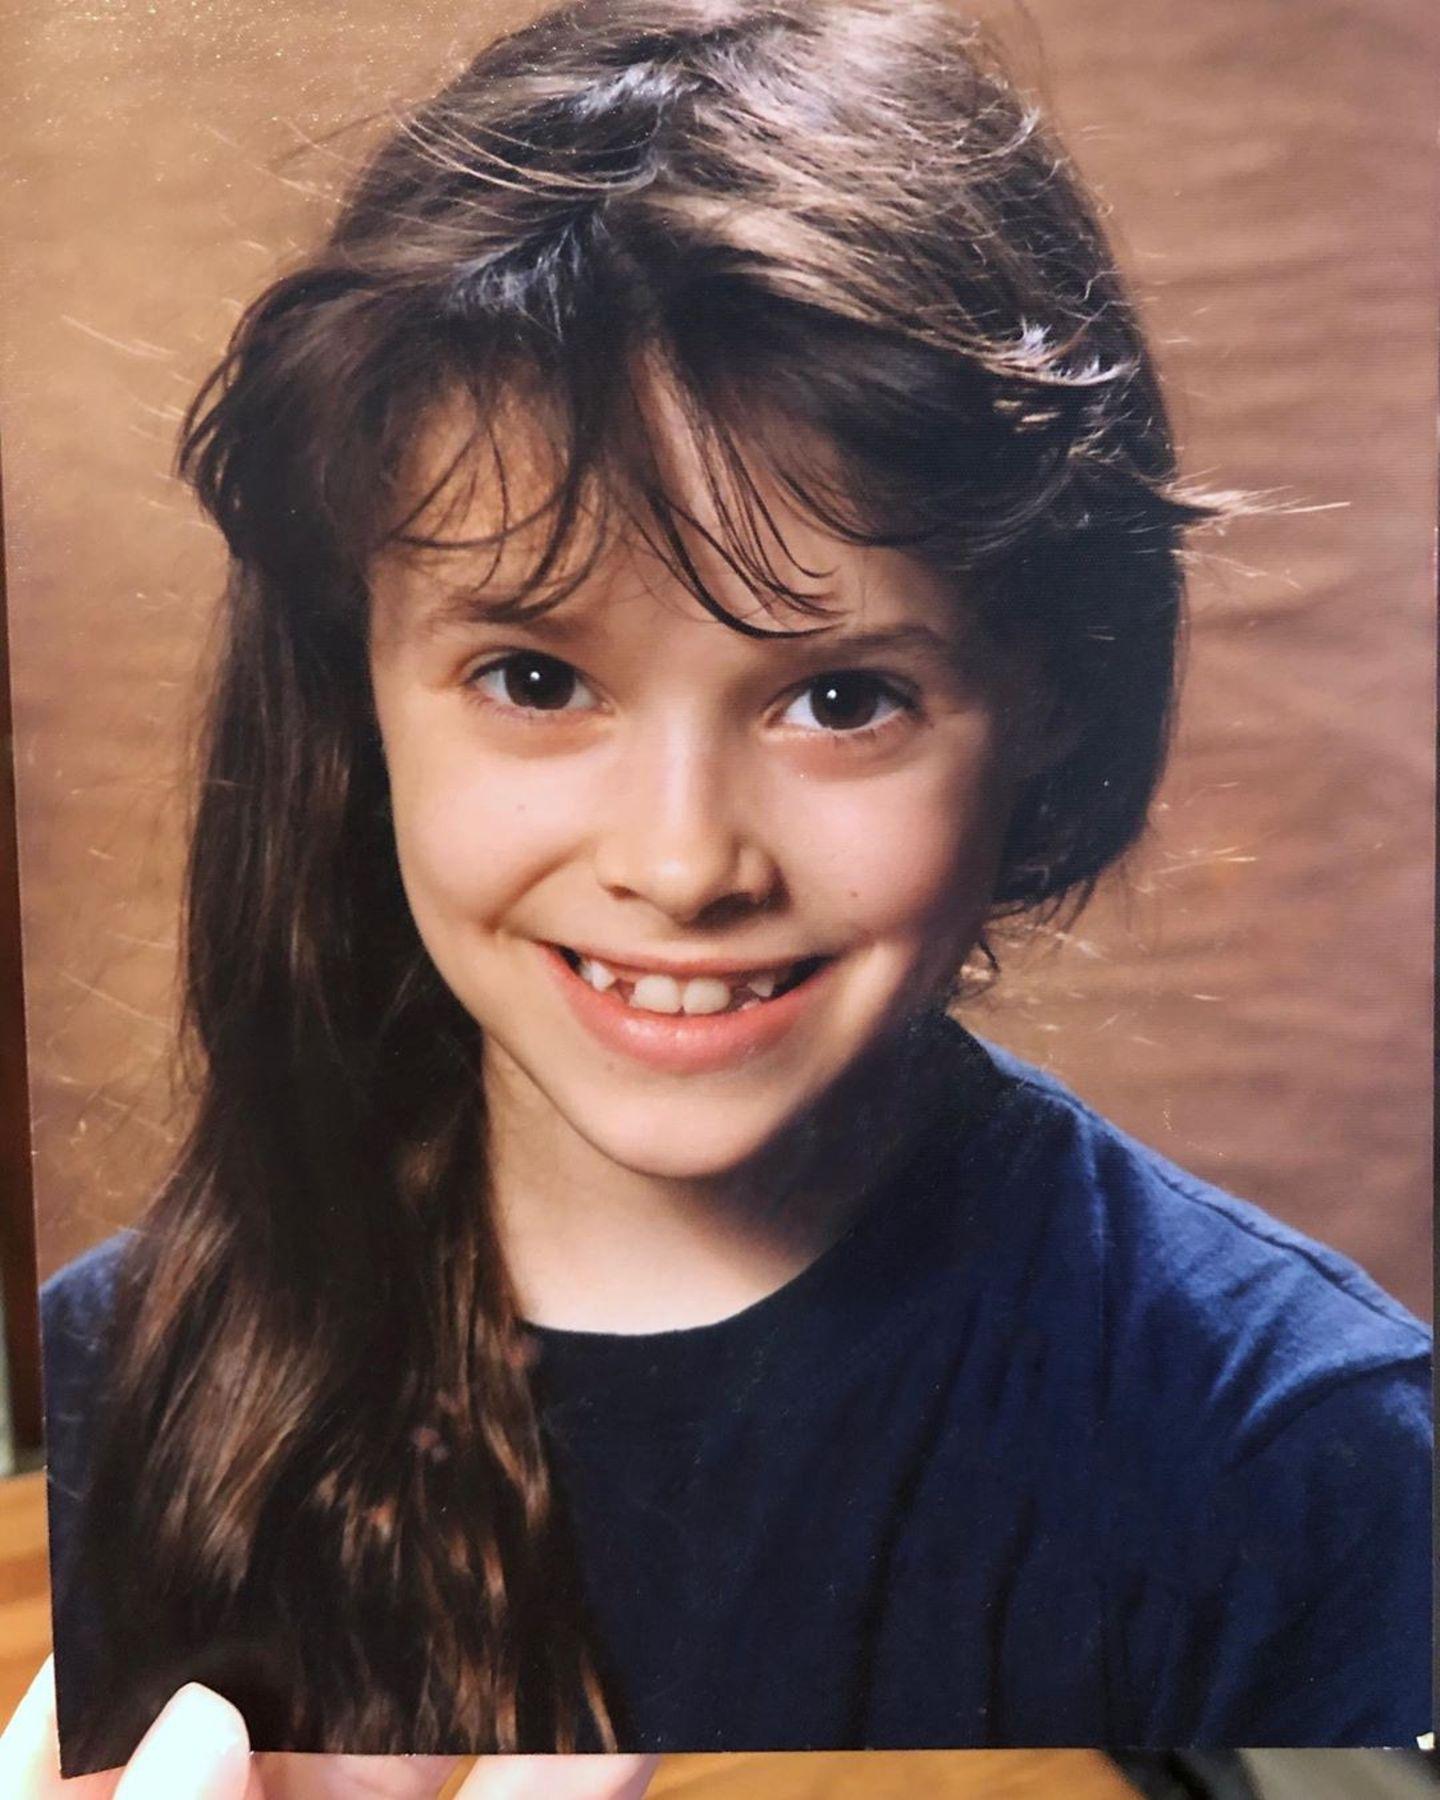 Kinderfotos der Stars: Daniela Katzenberger